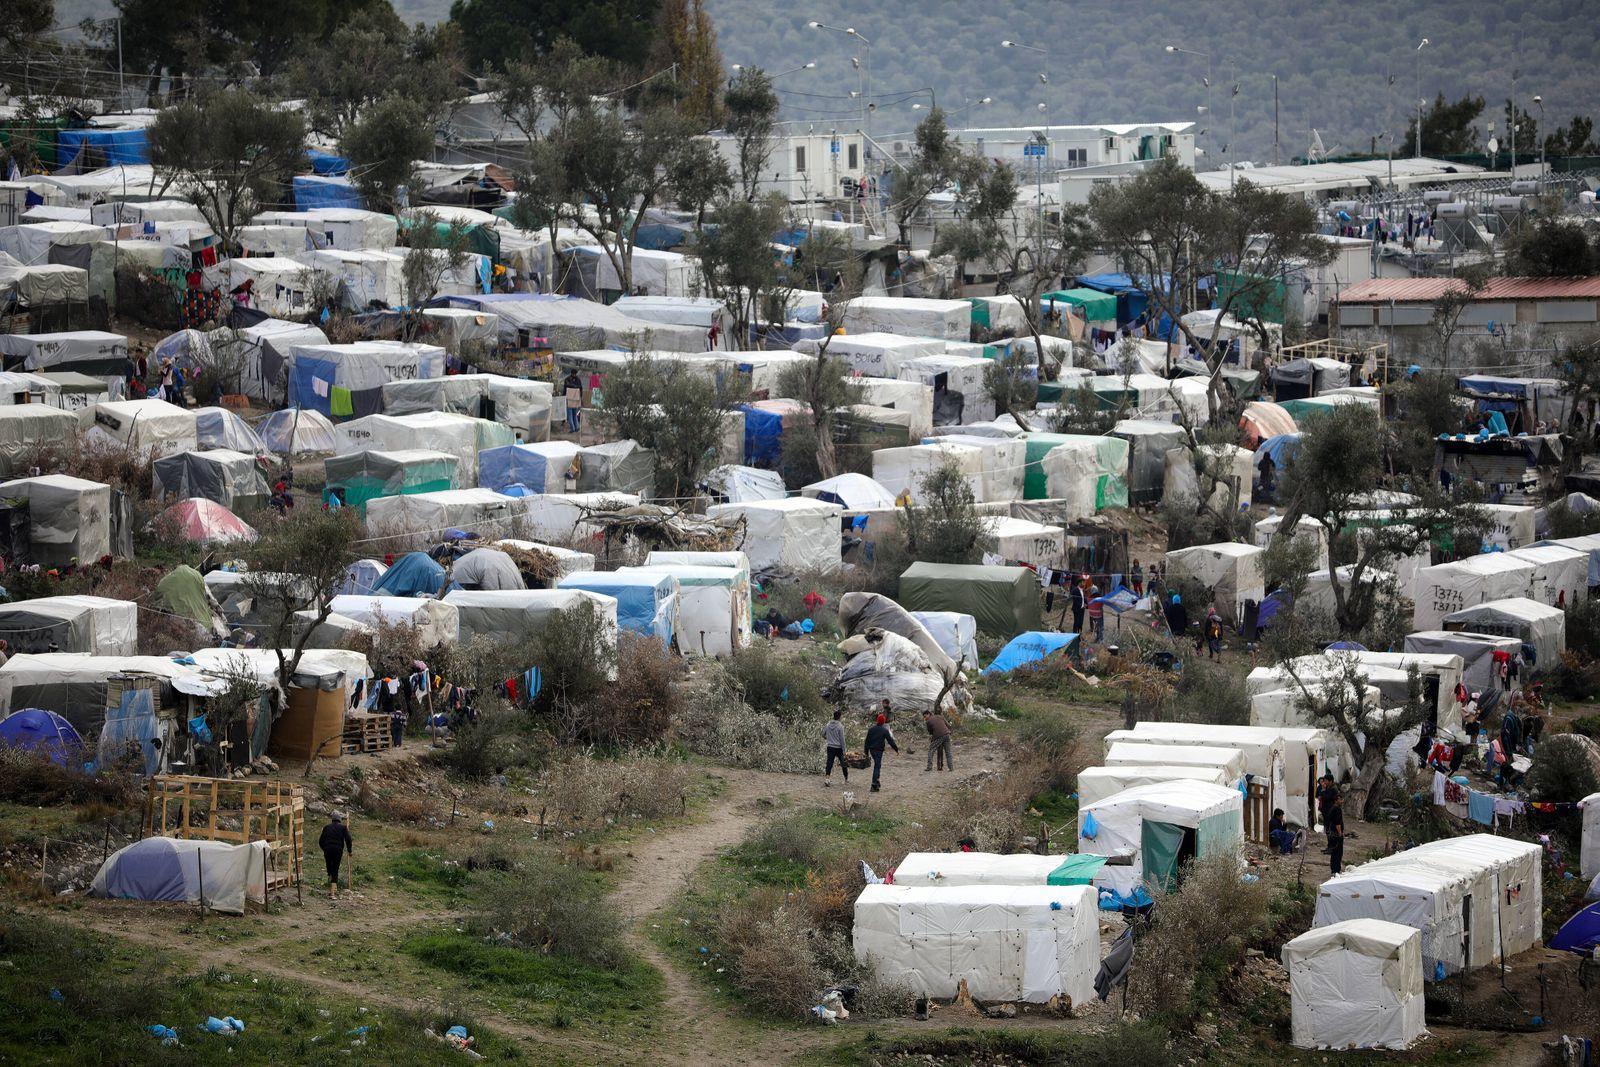 Moria refugee camp - Mitilyne, Greece 07.03.2020., Mitilyne, Greece - Moria refugee camp on the island of Lesbos was or